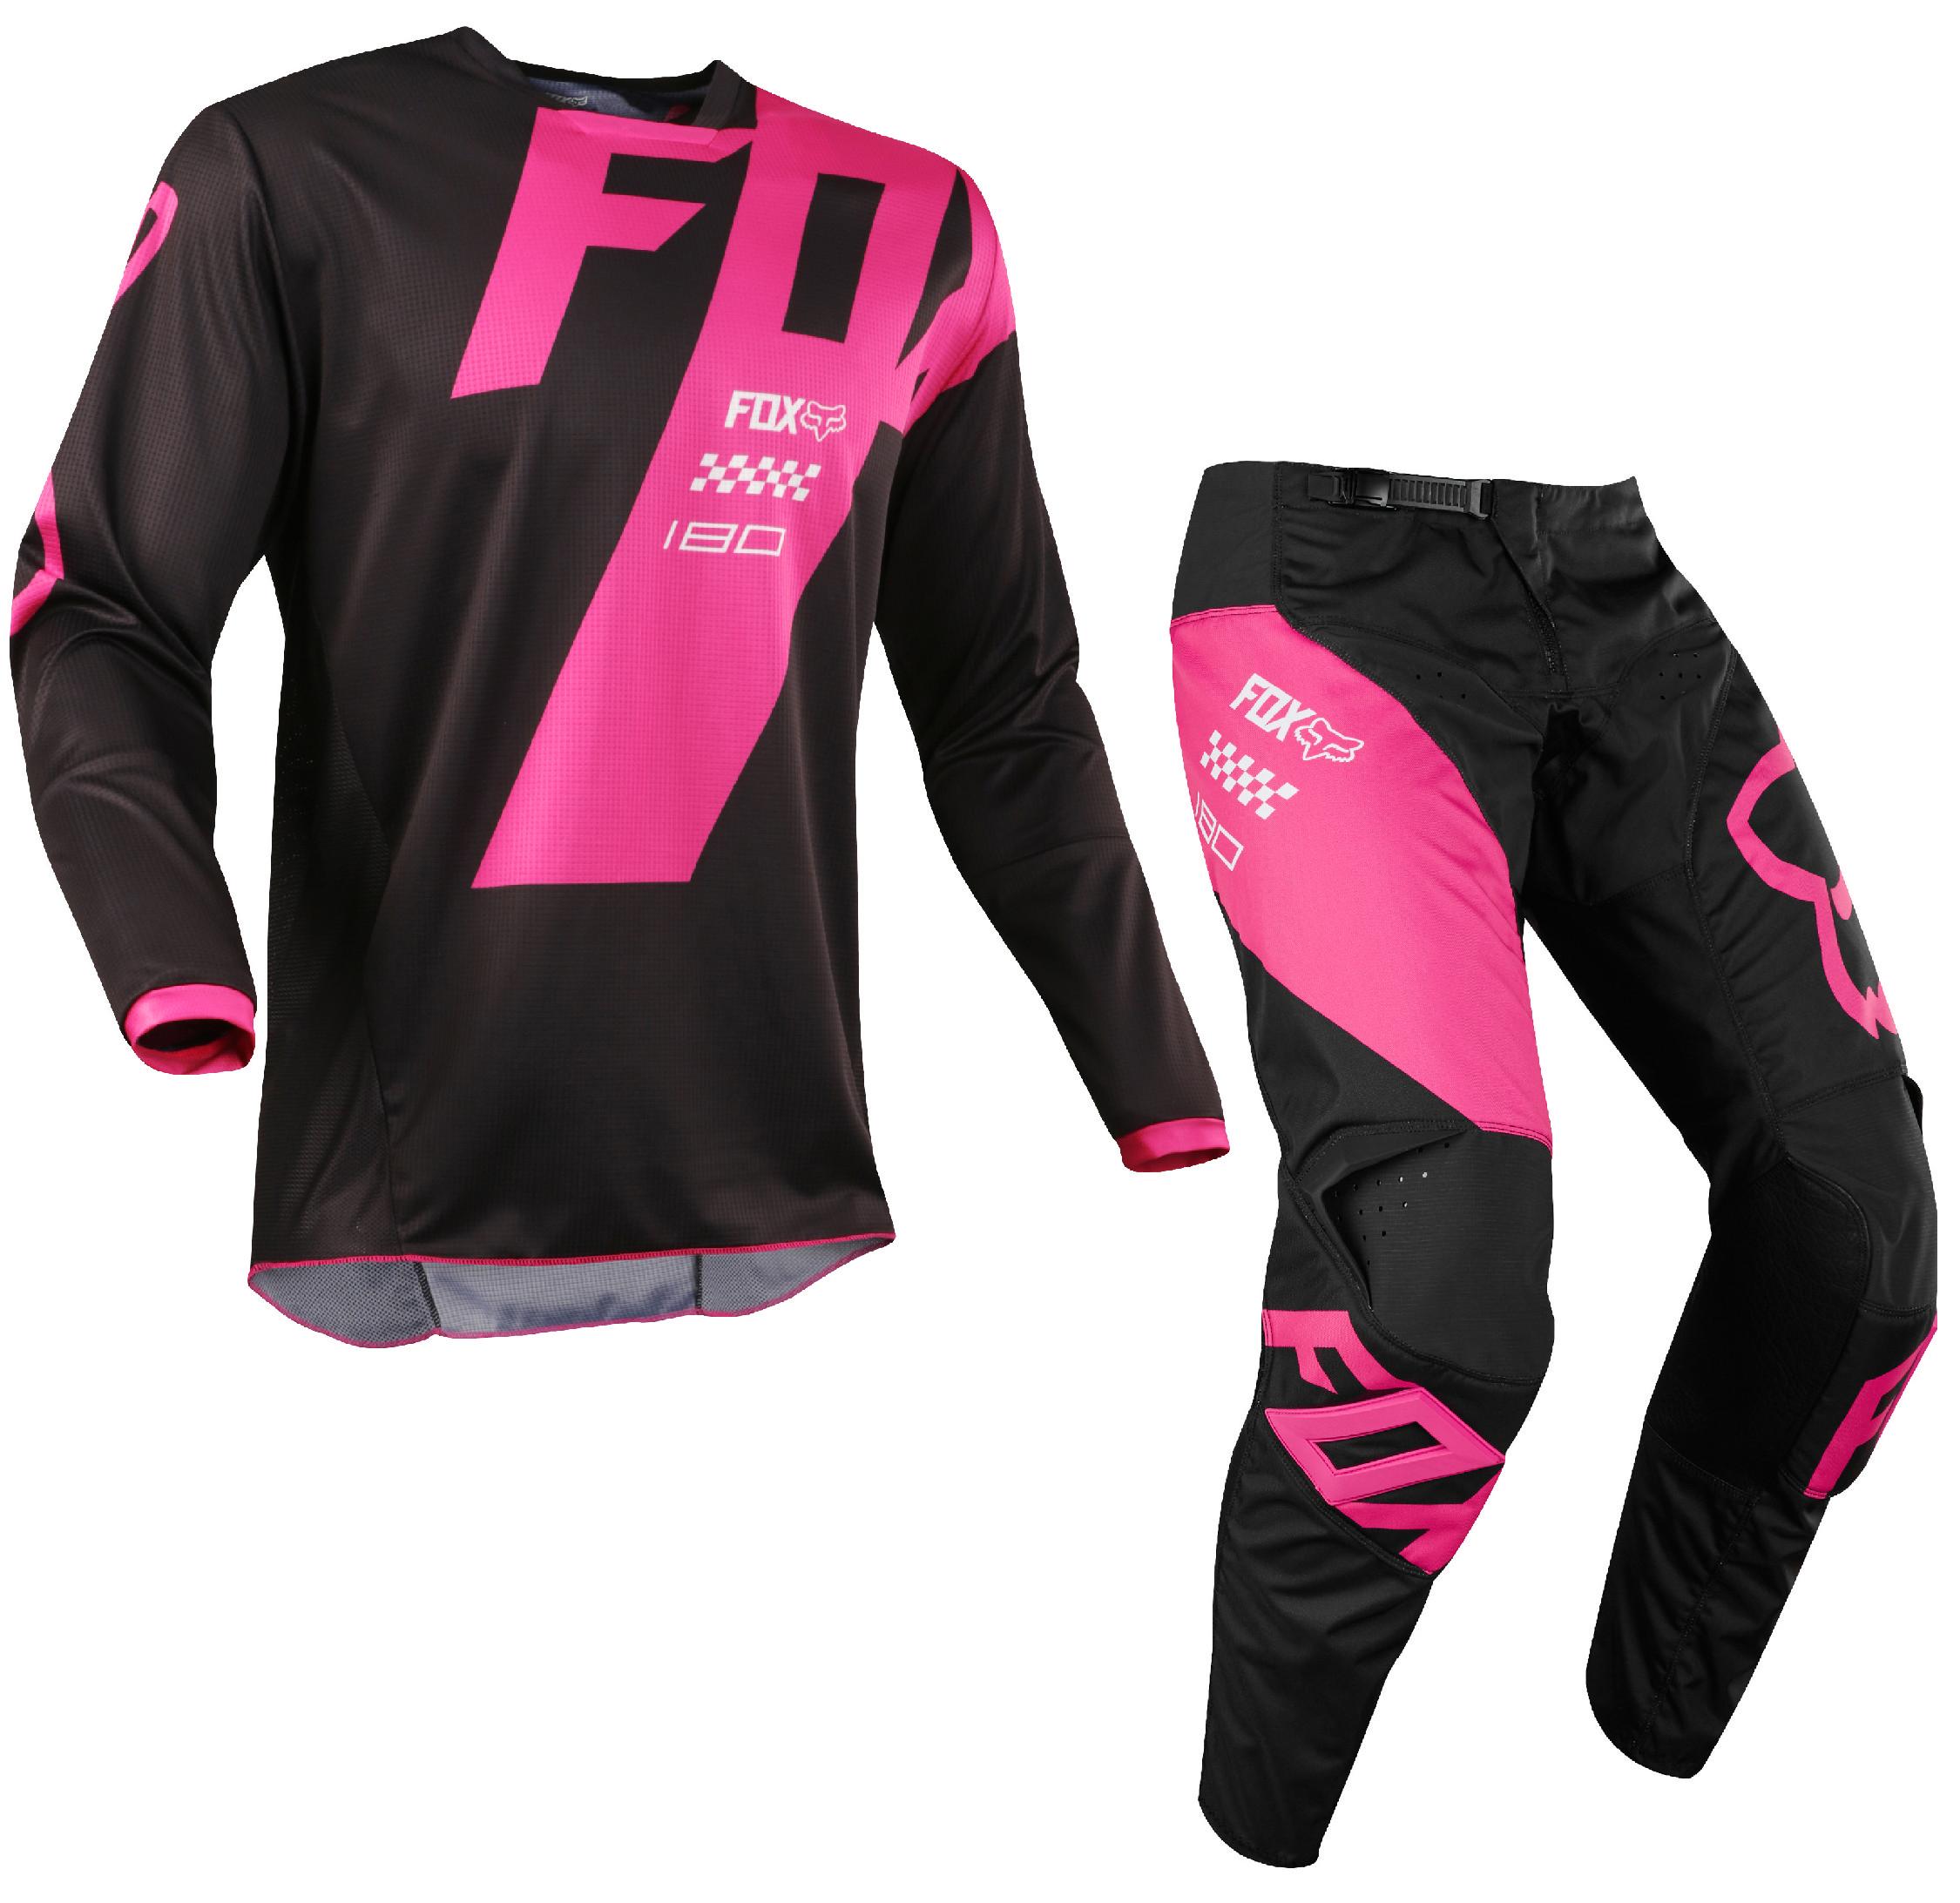 Fox Racing 2018 180 Mastar Jersey//Pants Adult Mens Combo Offroad MX Gear Motocross Riding Gear Black